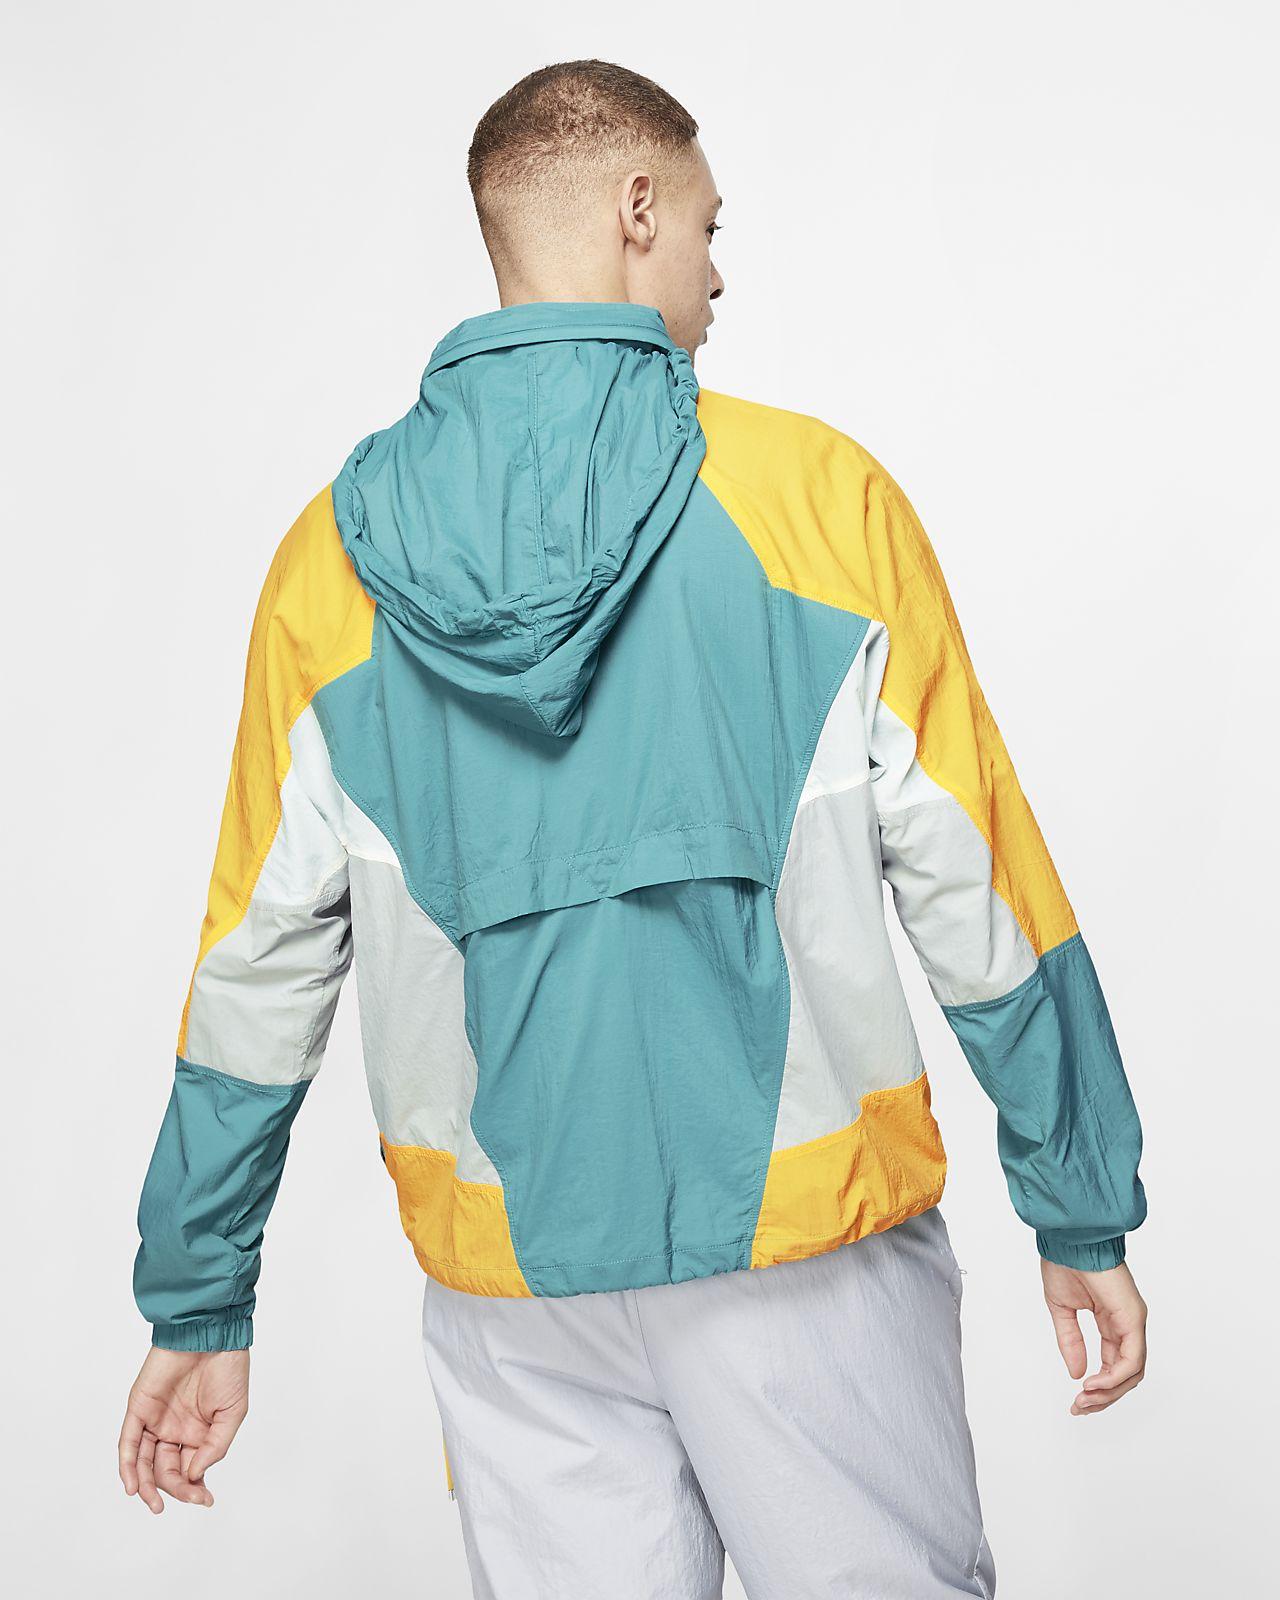 Tejido Nike Capucha Con Hombre Chaqueta Sportswear De Woven SUMzqVp